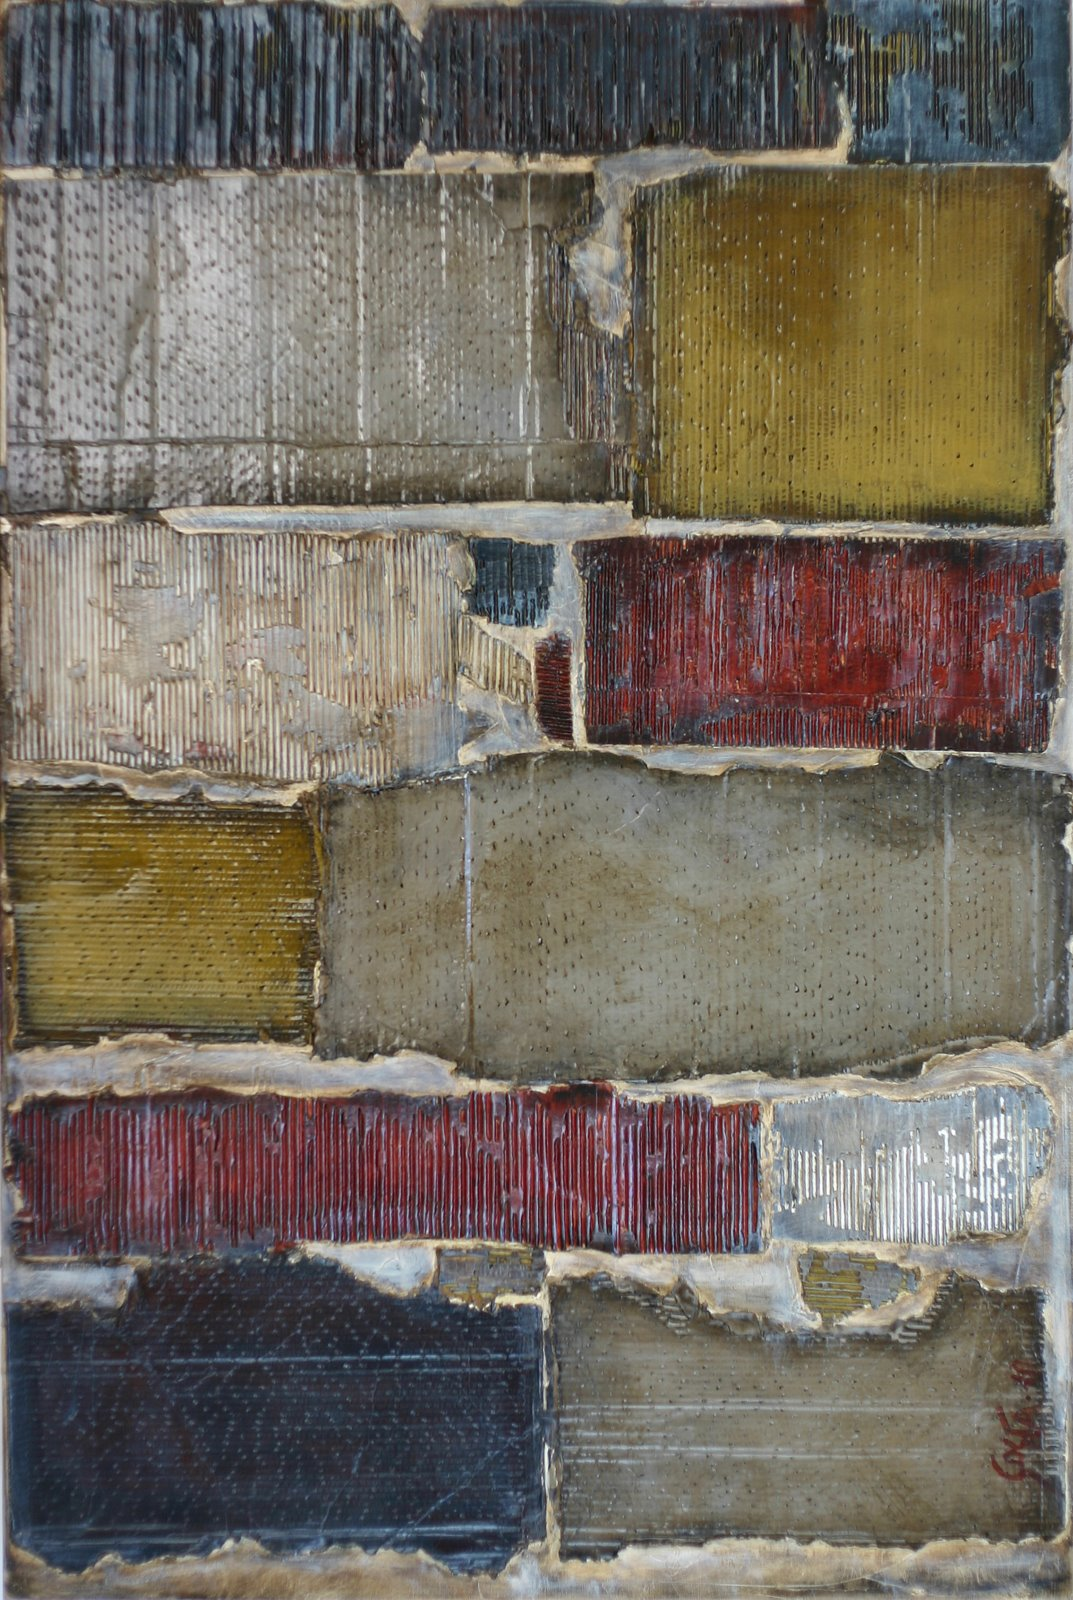 Tableau Contemporain, Tribute 2. Sophie Costa, artiste peintre.